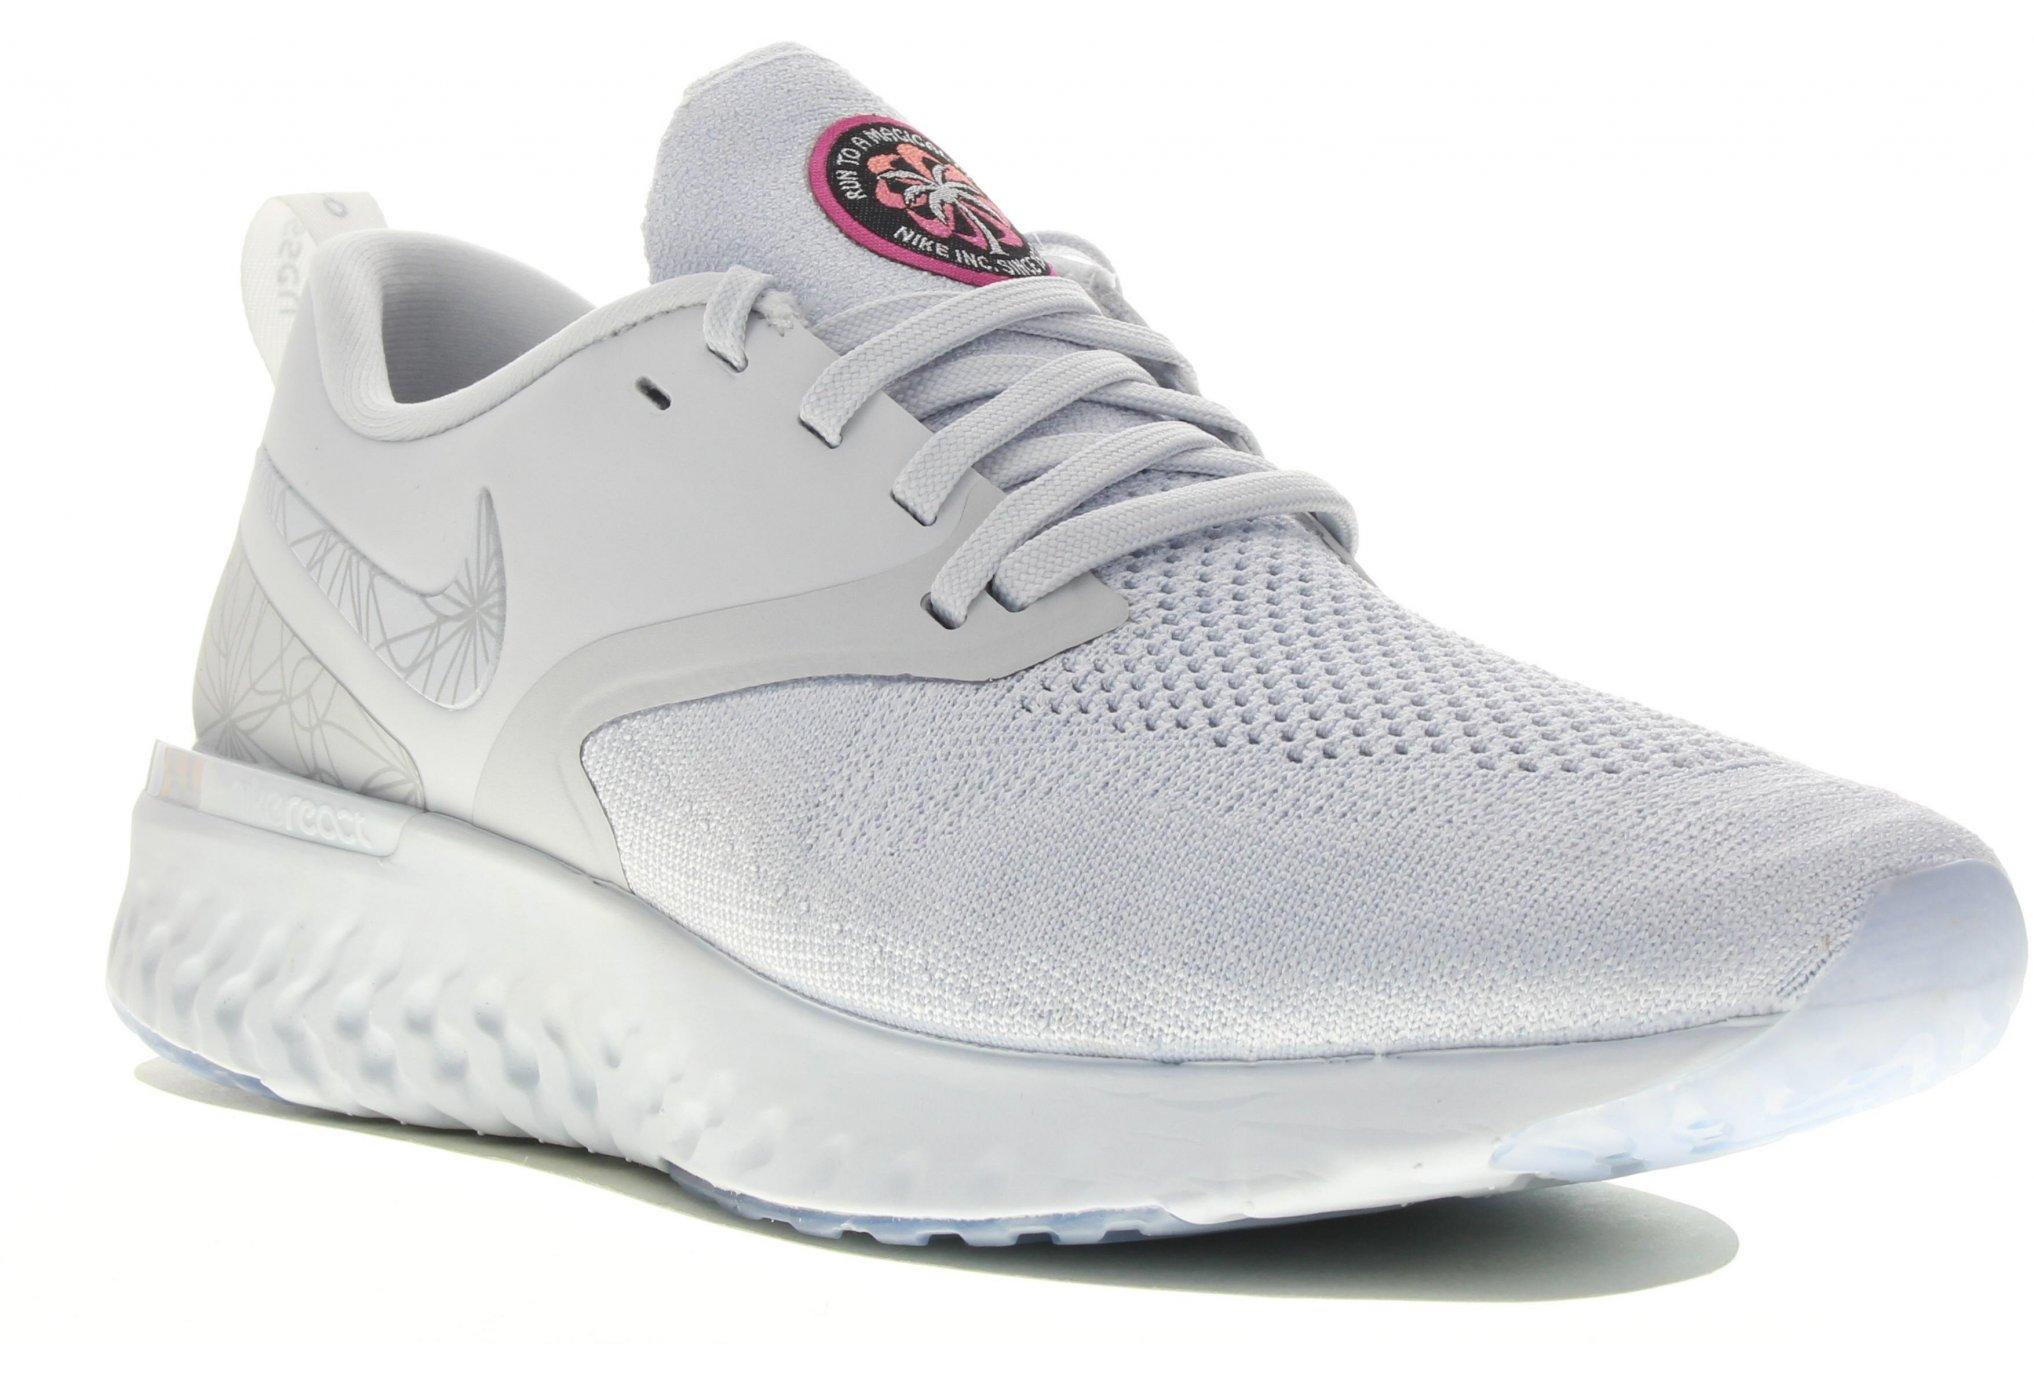 Nike Odyssey React Flyknit 2 GPX M Diététique Chaussures homme